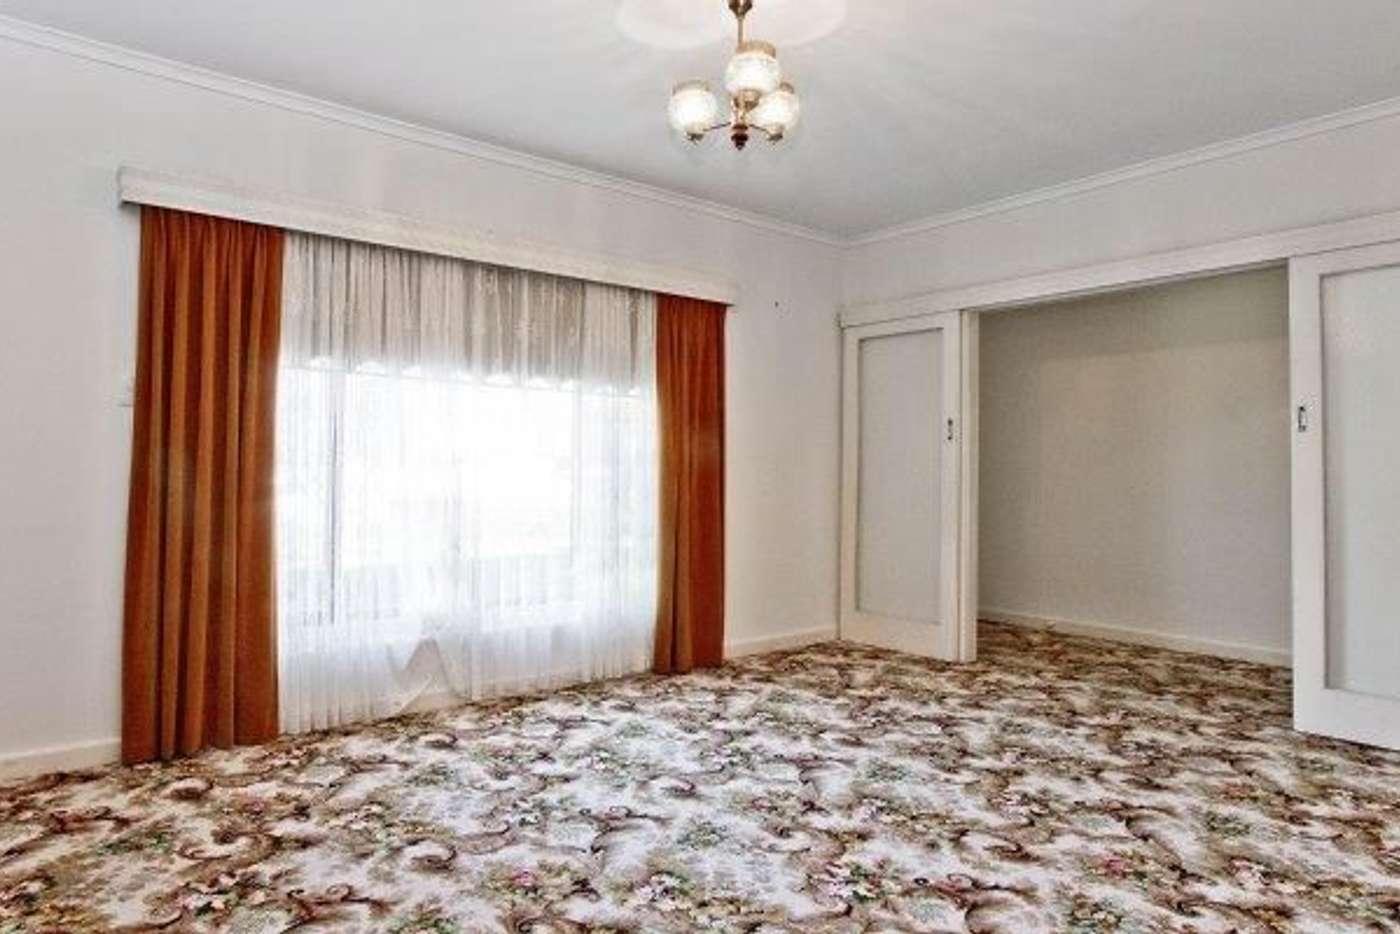 Seventh view of Homely house listing, 36 Valetta Road, Kidman Park SA 5025